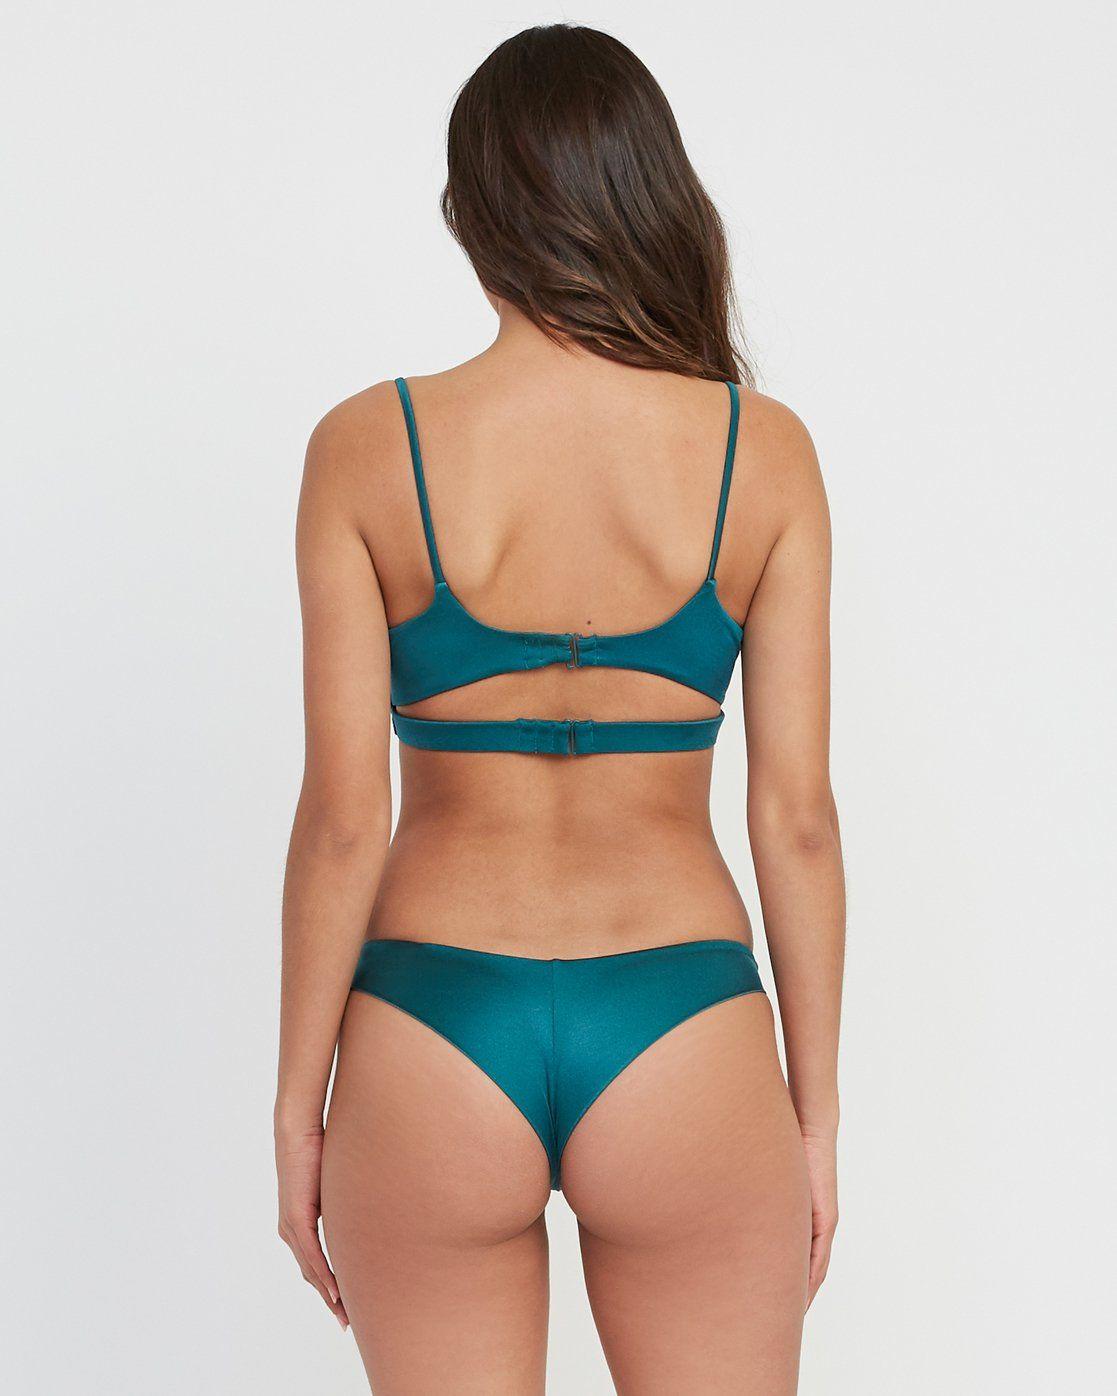 Clinched bikini bottoms